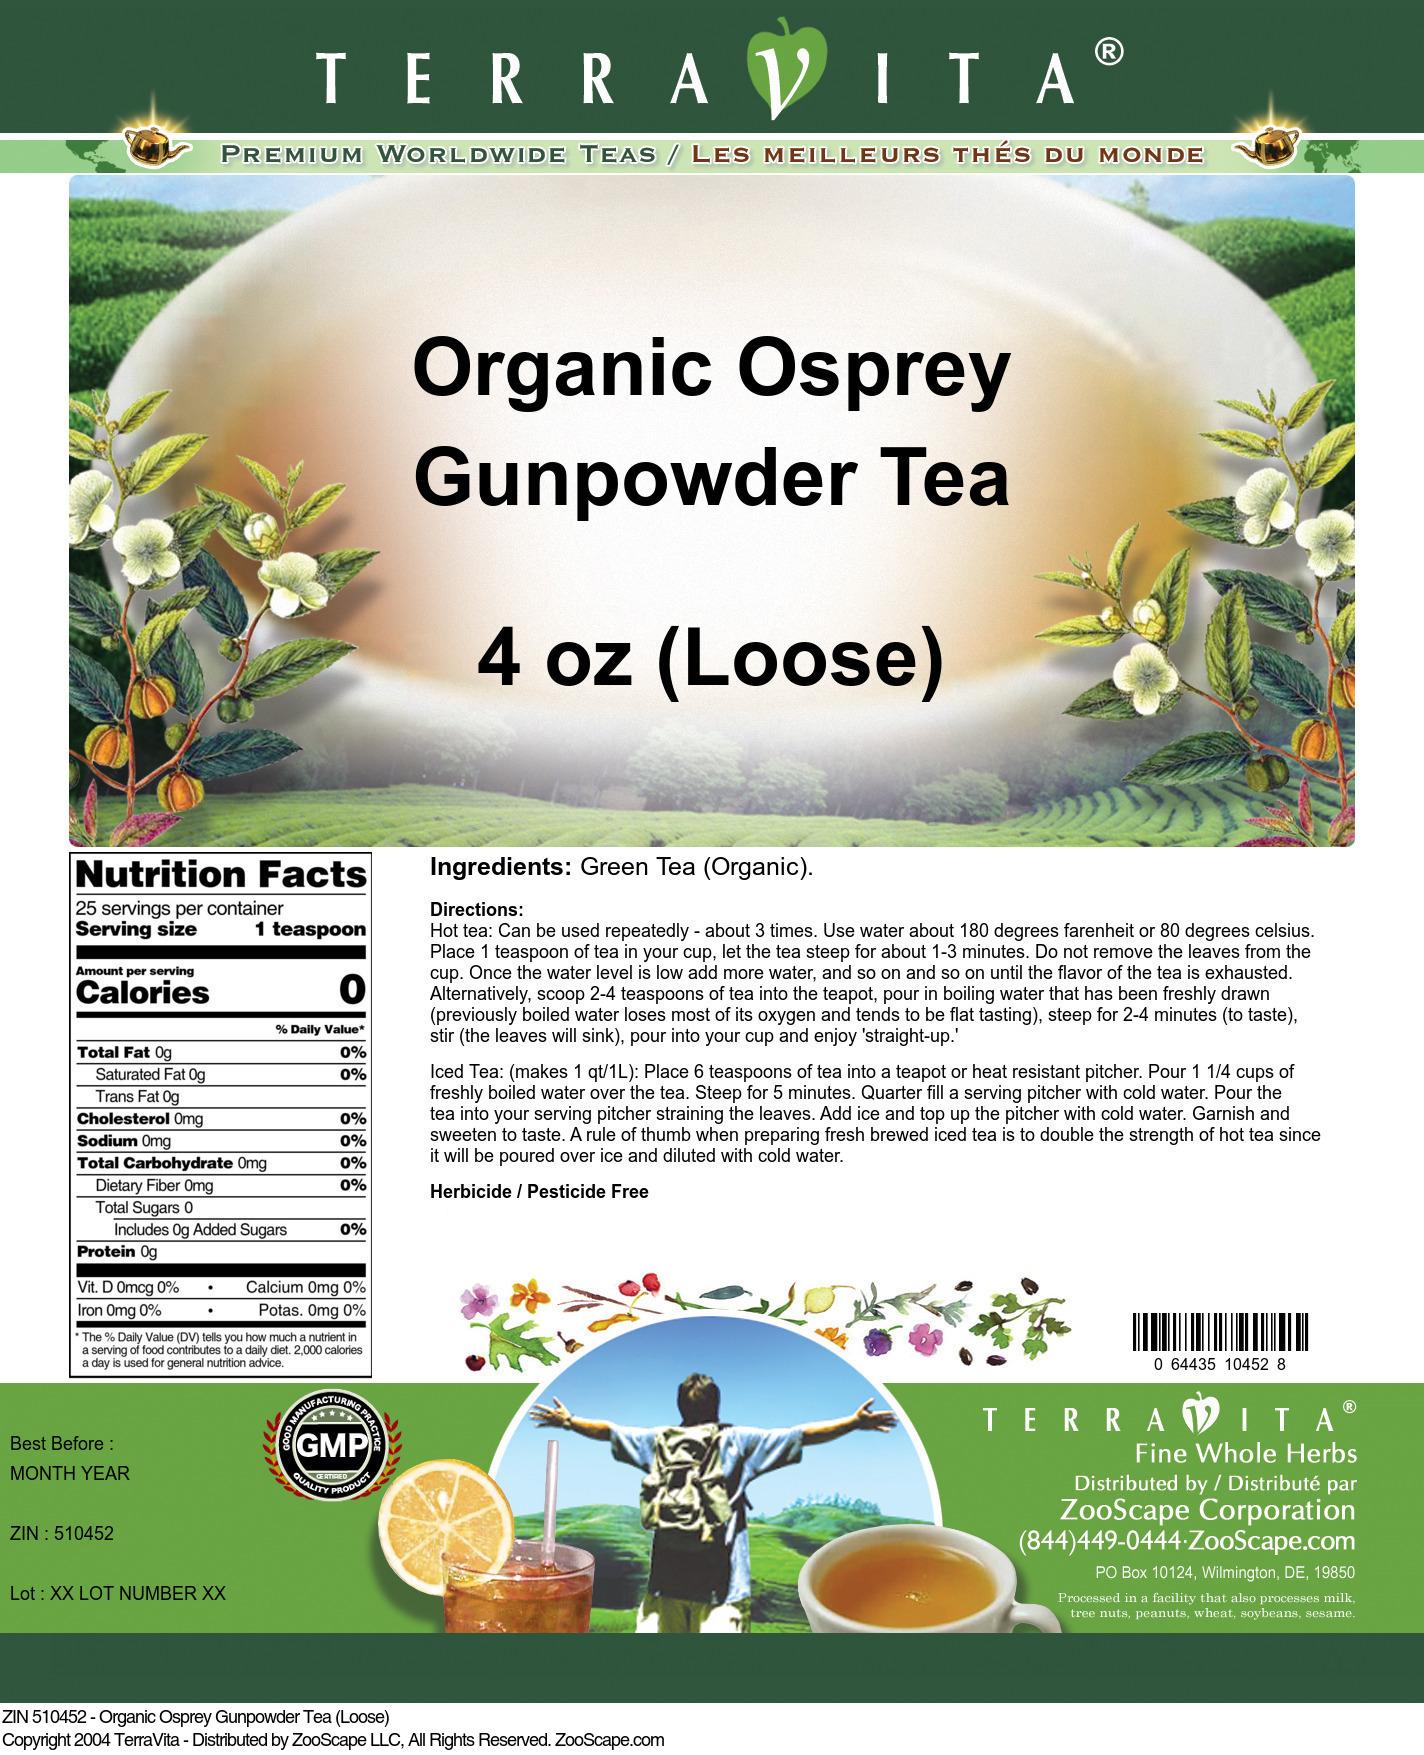 Organic Osprey Gunpowder Tea (Loose)